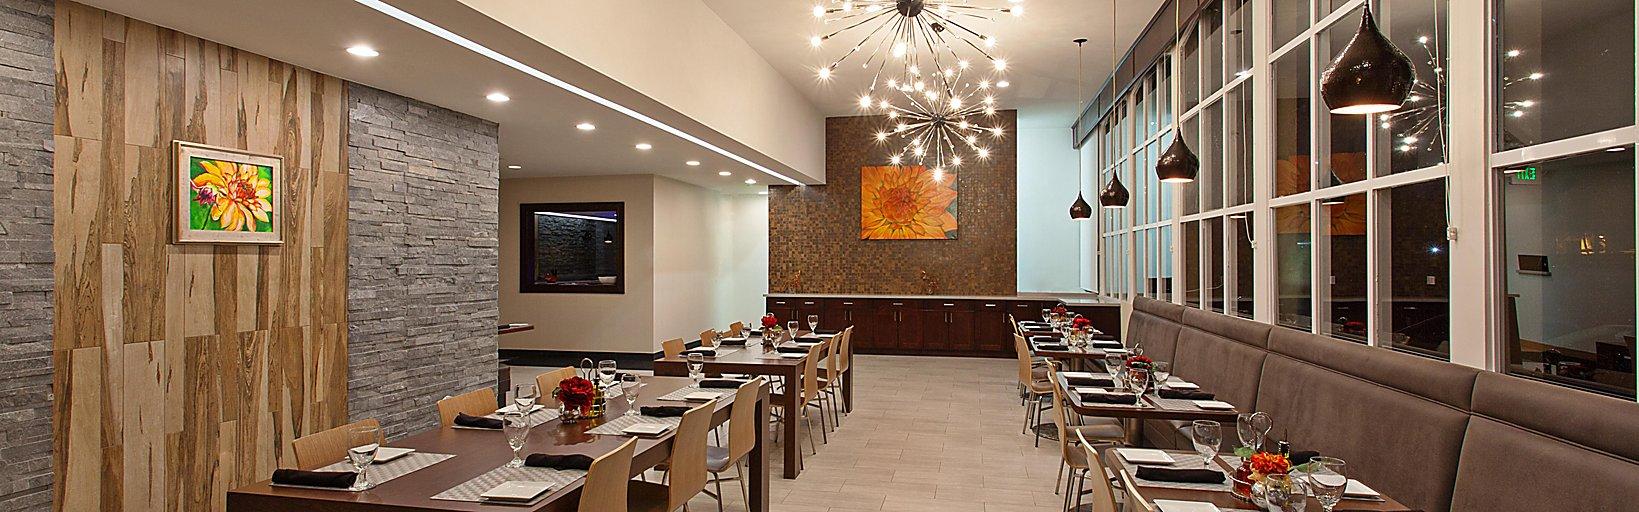 Restaurants Near Holiday Inn West Covina